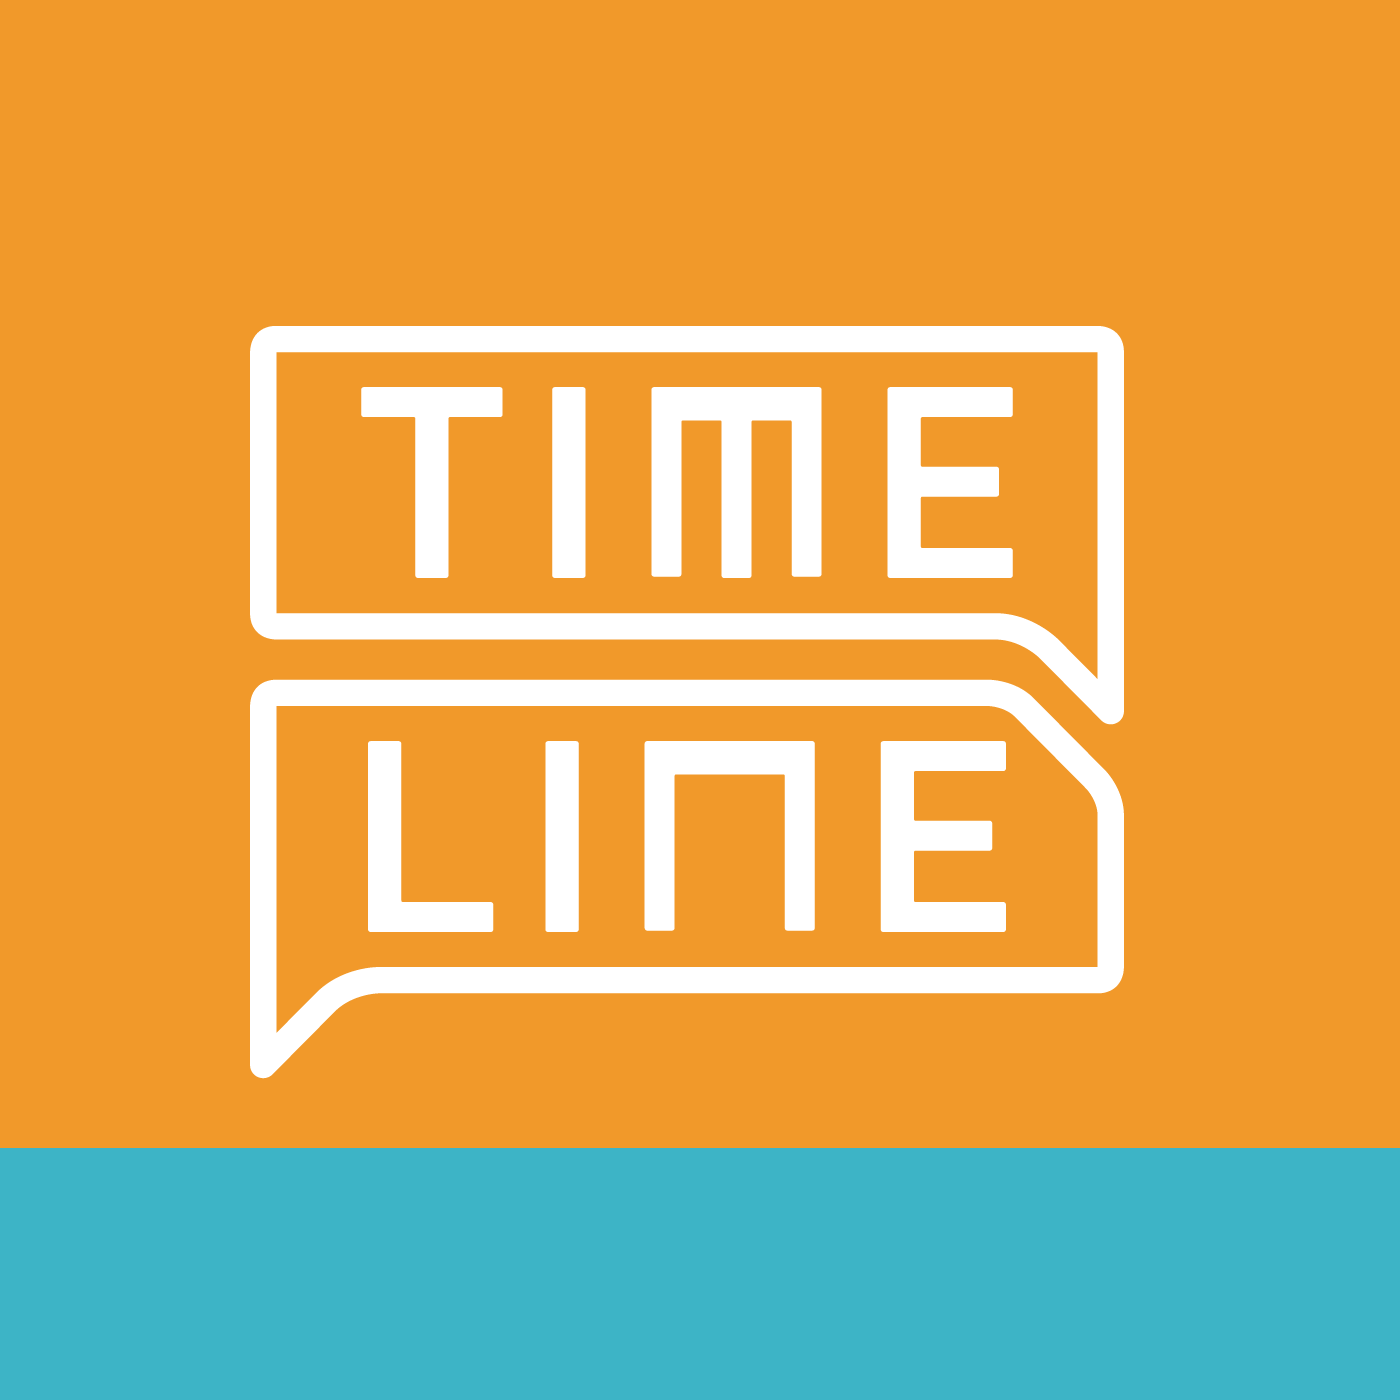 Timeline Gaúcha 23/10/2017